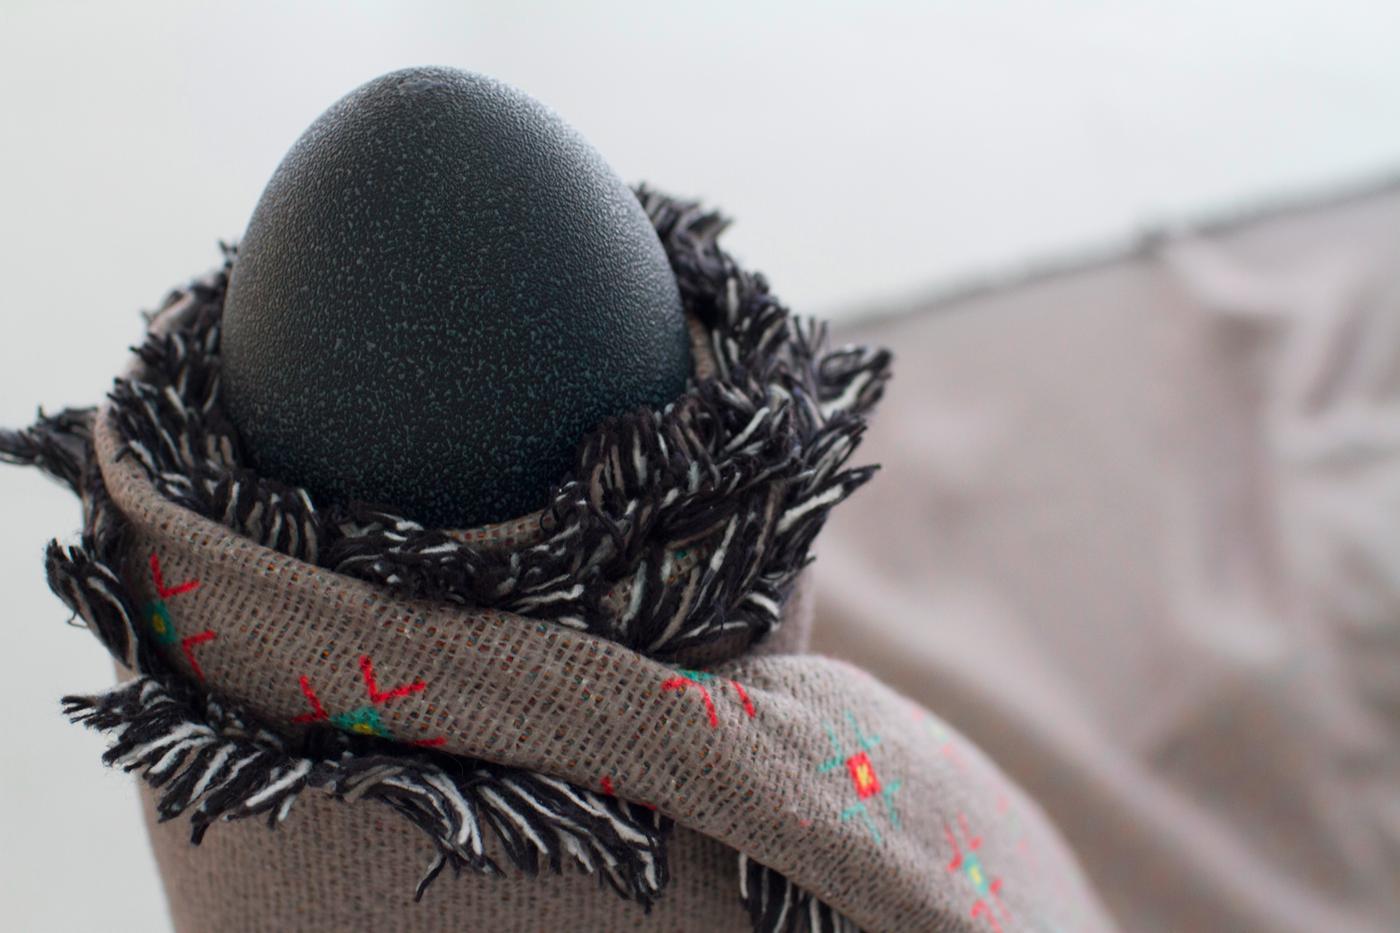 Tz-close-up-emu-egg